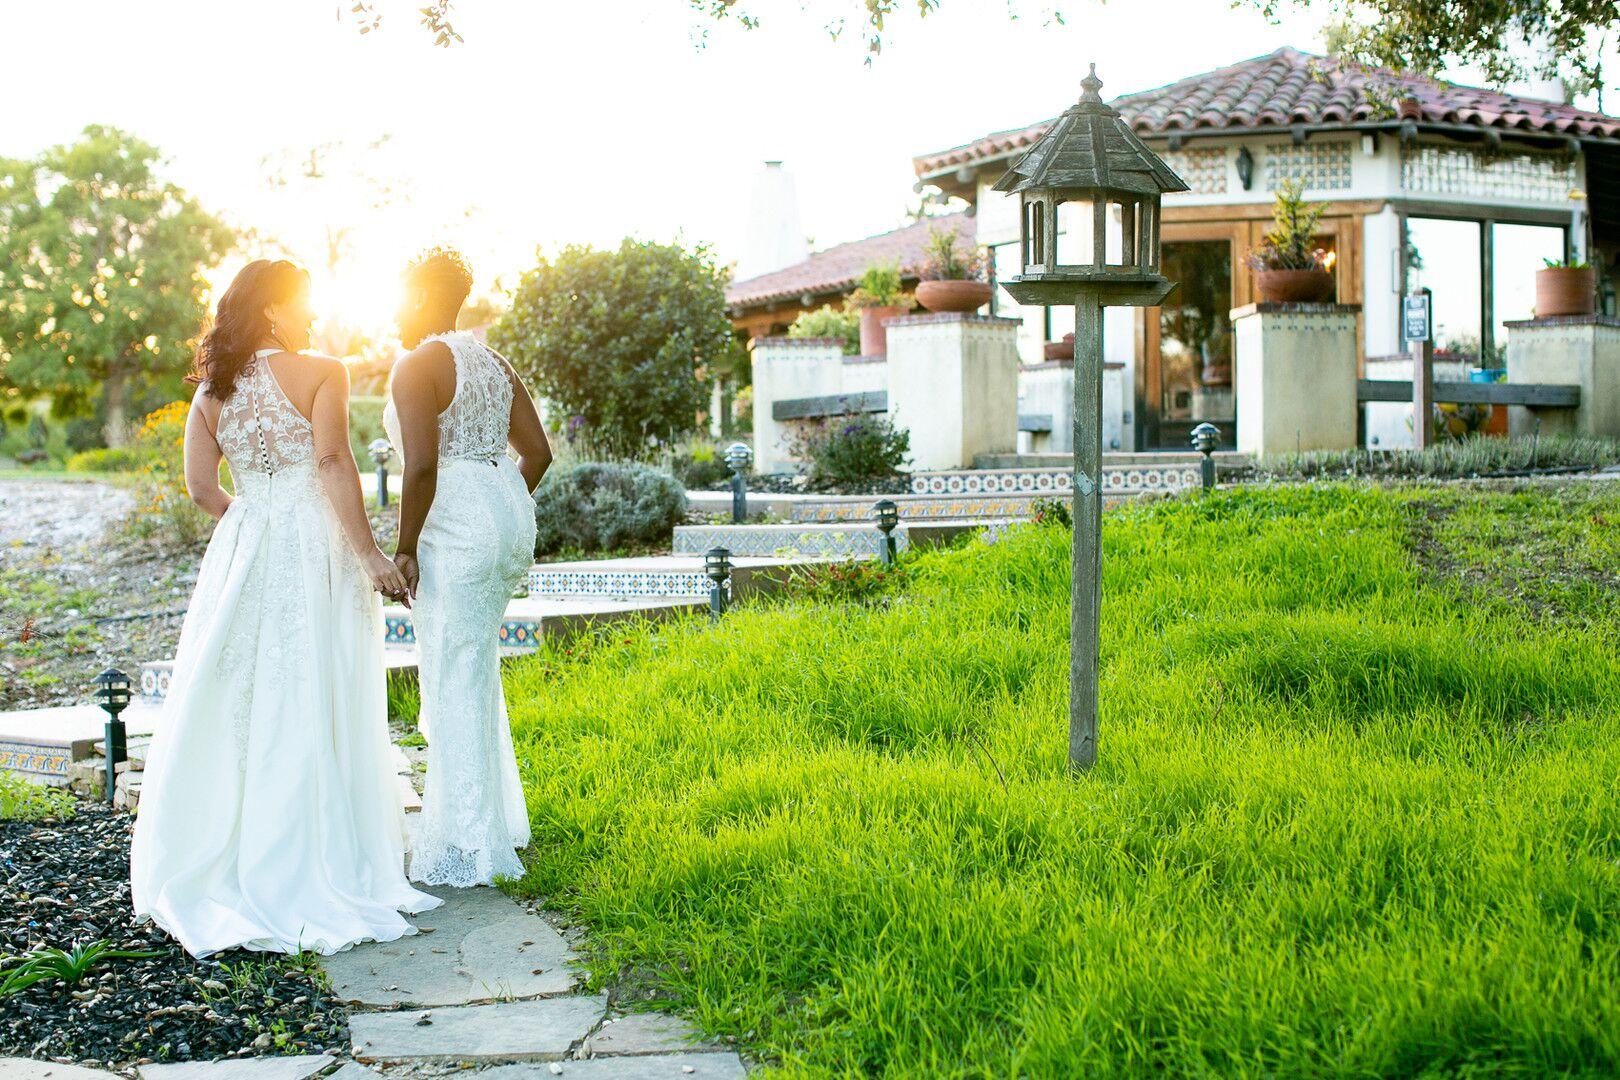 www.santabarbarawedding.com | Venue: The Casitas of Arroyo Grande | Photographer: Renoda Campbell Photography | Second Shooter: John Patrick Images |  Brides and Venue